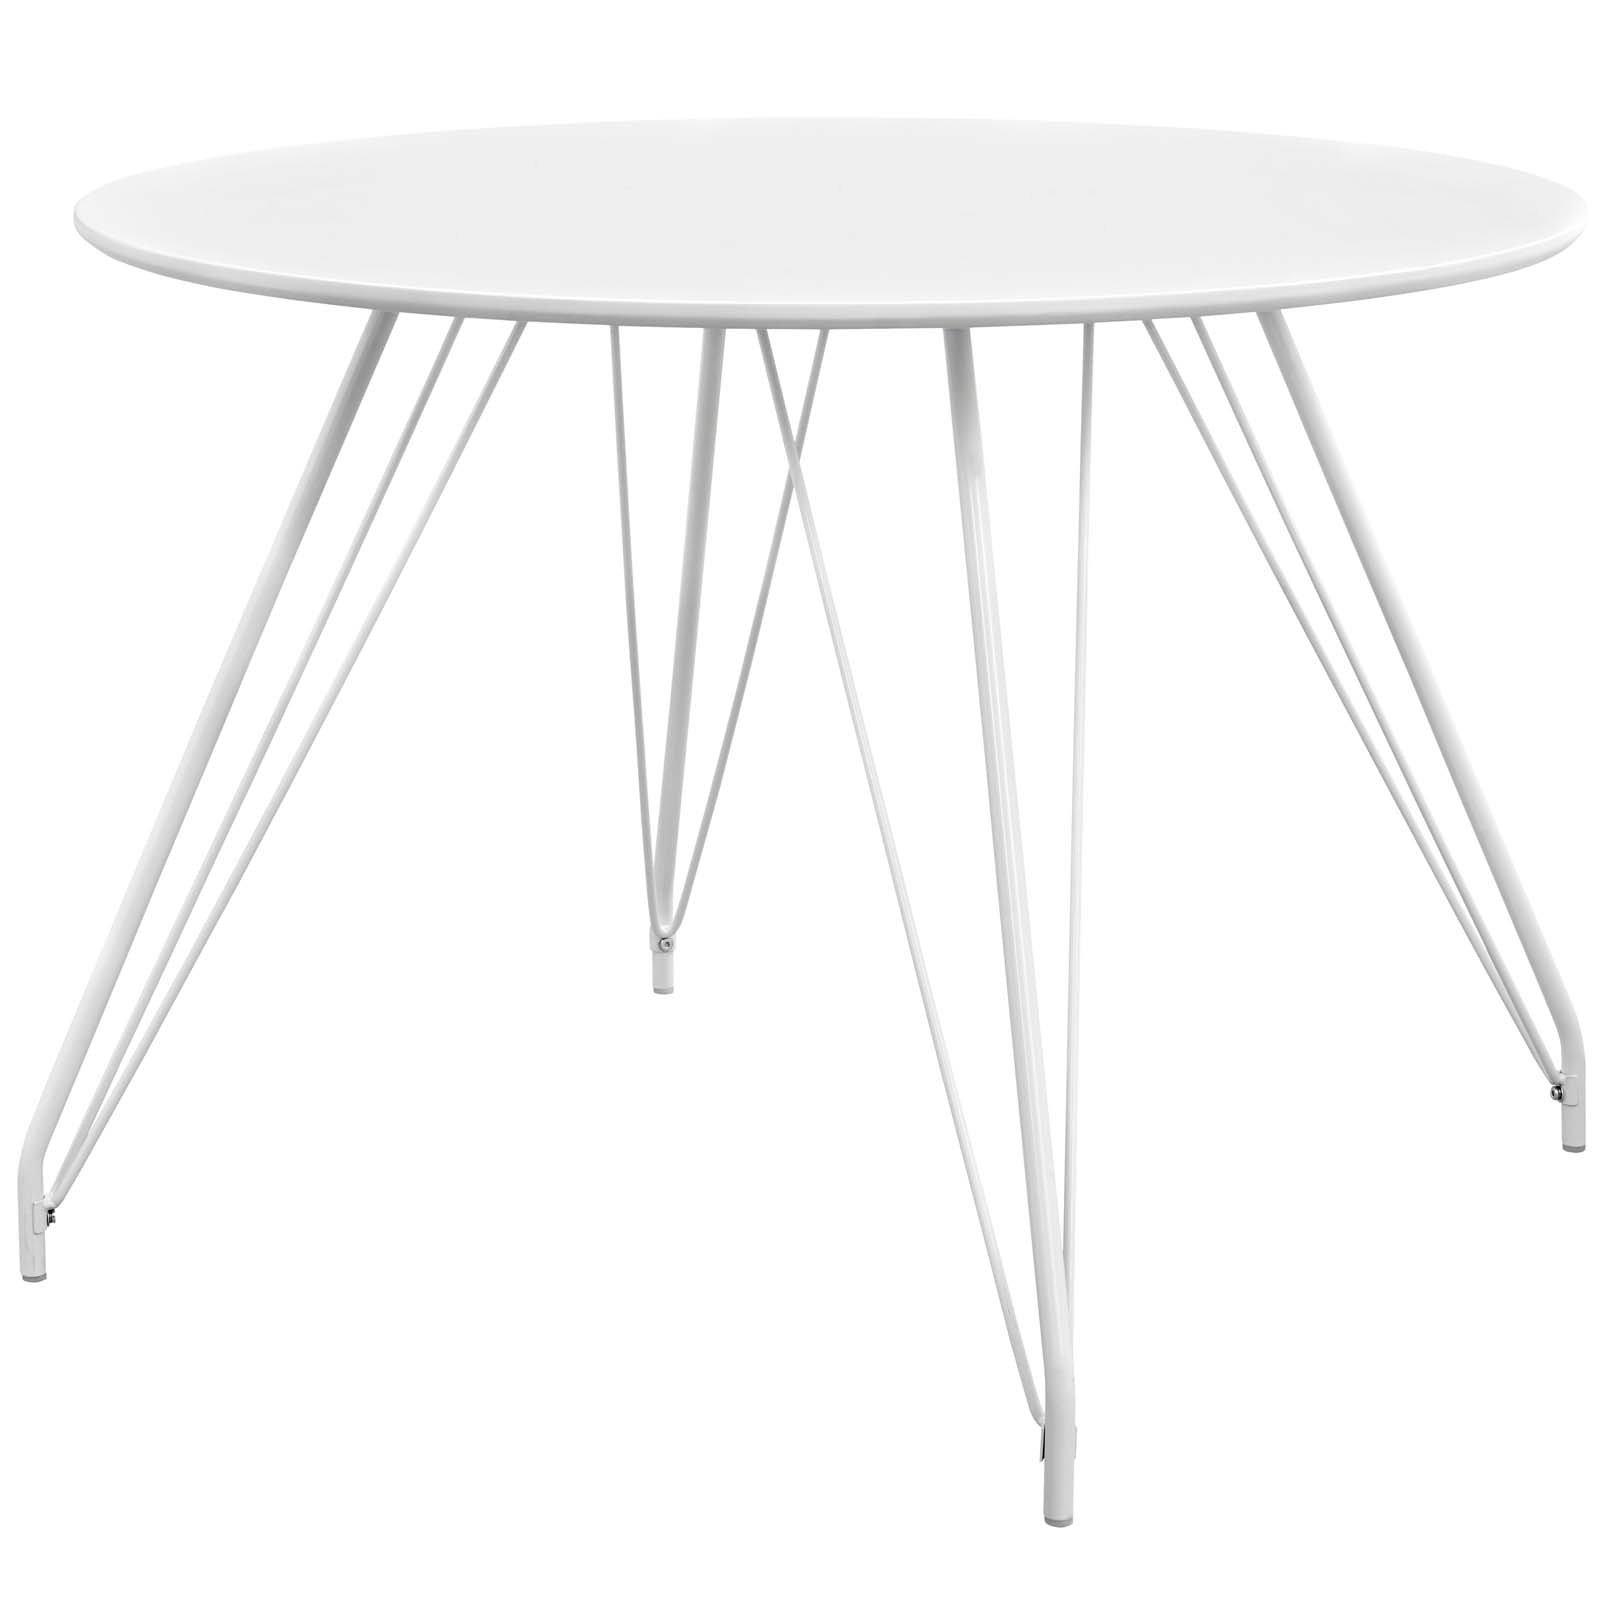 Satellite Circular Dining Table – White – Free Shipping Today Inside Latest White Circular Dining Tables (View 16 of 25)